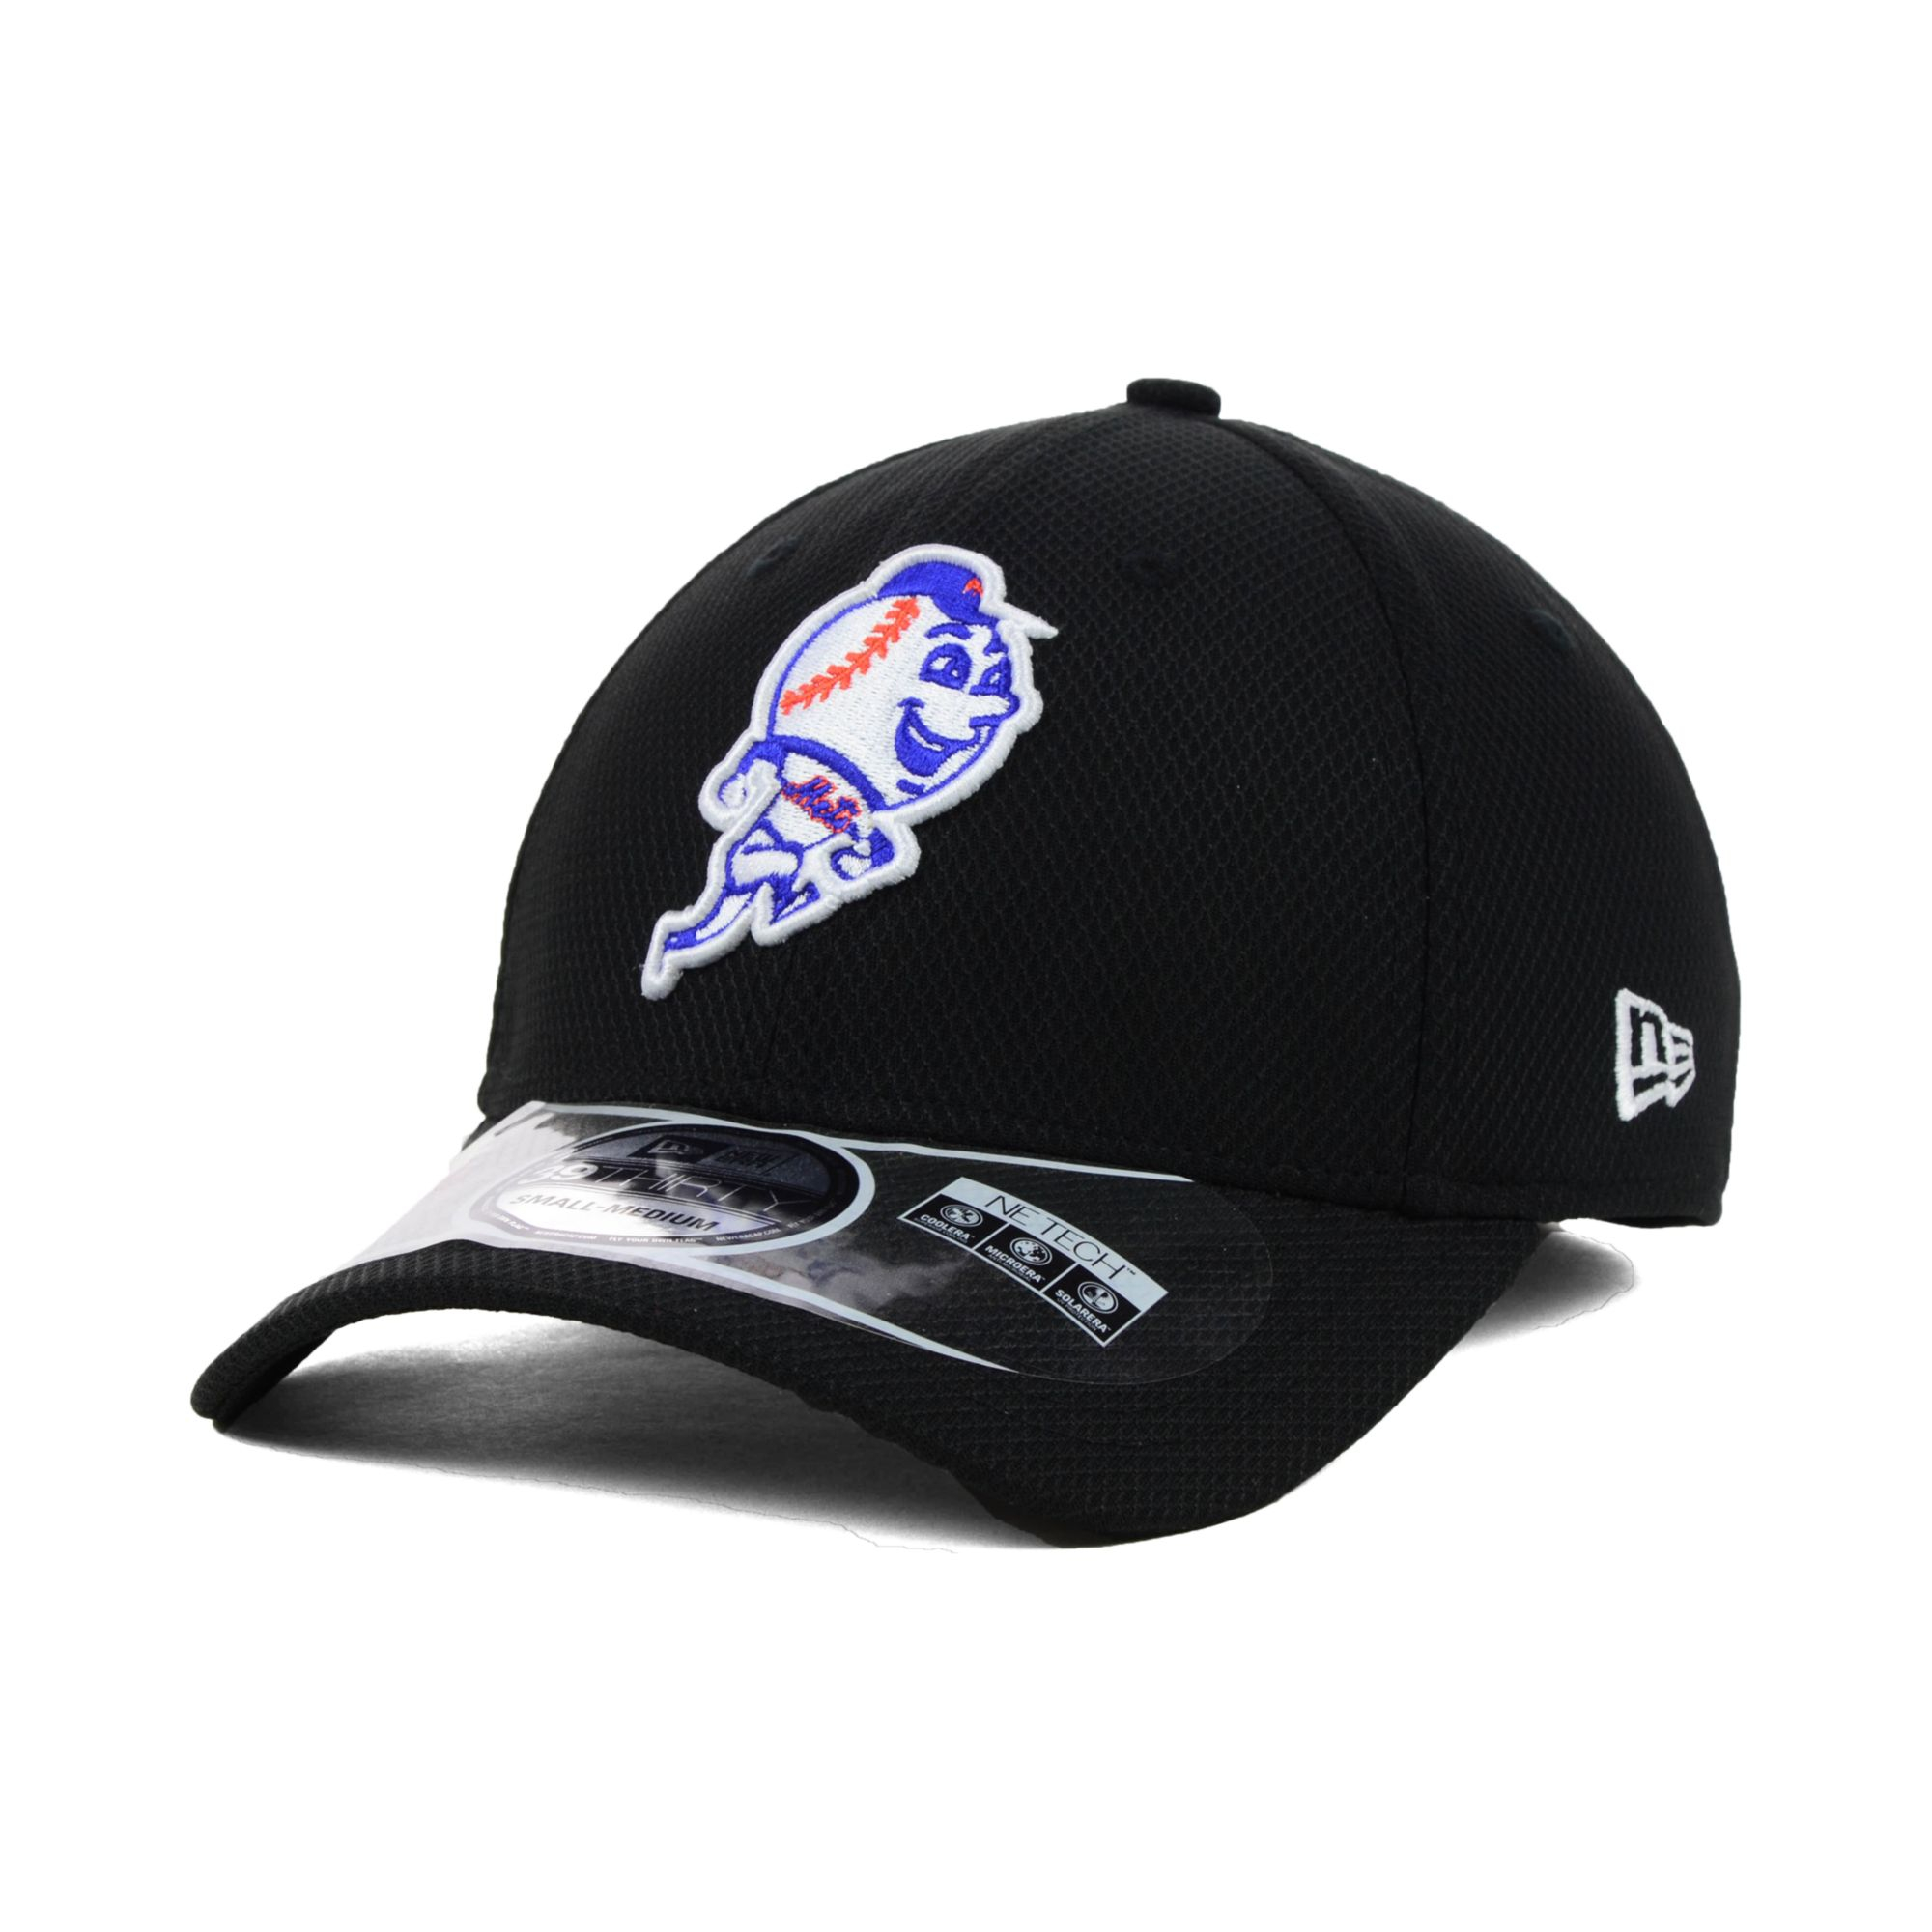 fc360e29e048a5 KTZ New York Mets Mlb Diamond Era Black 39thirty Cap in Black for ...